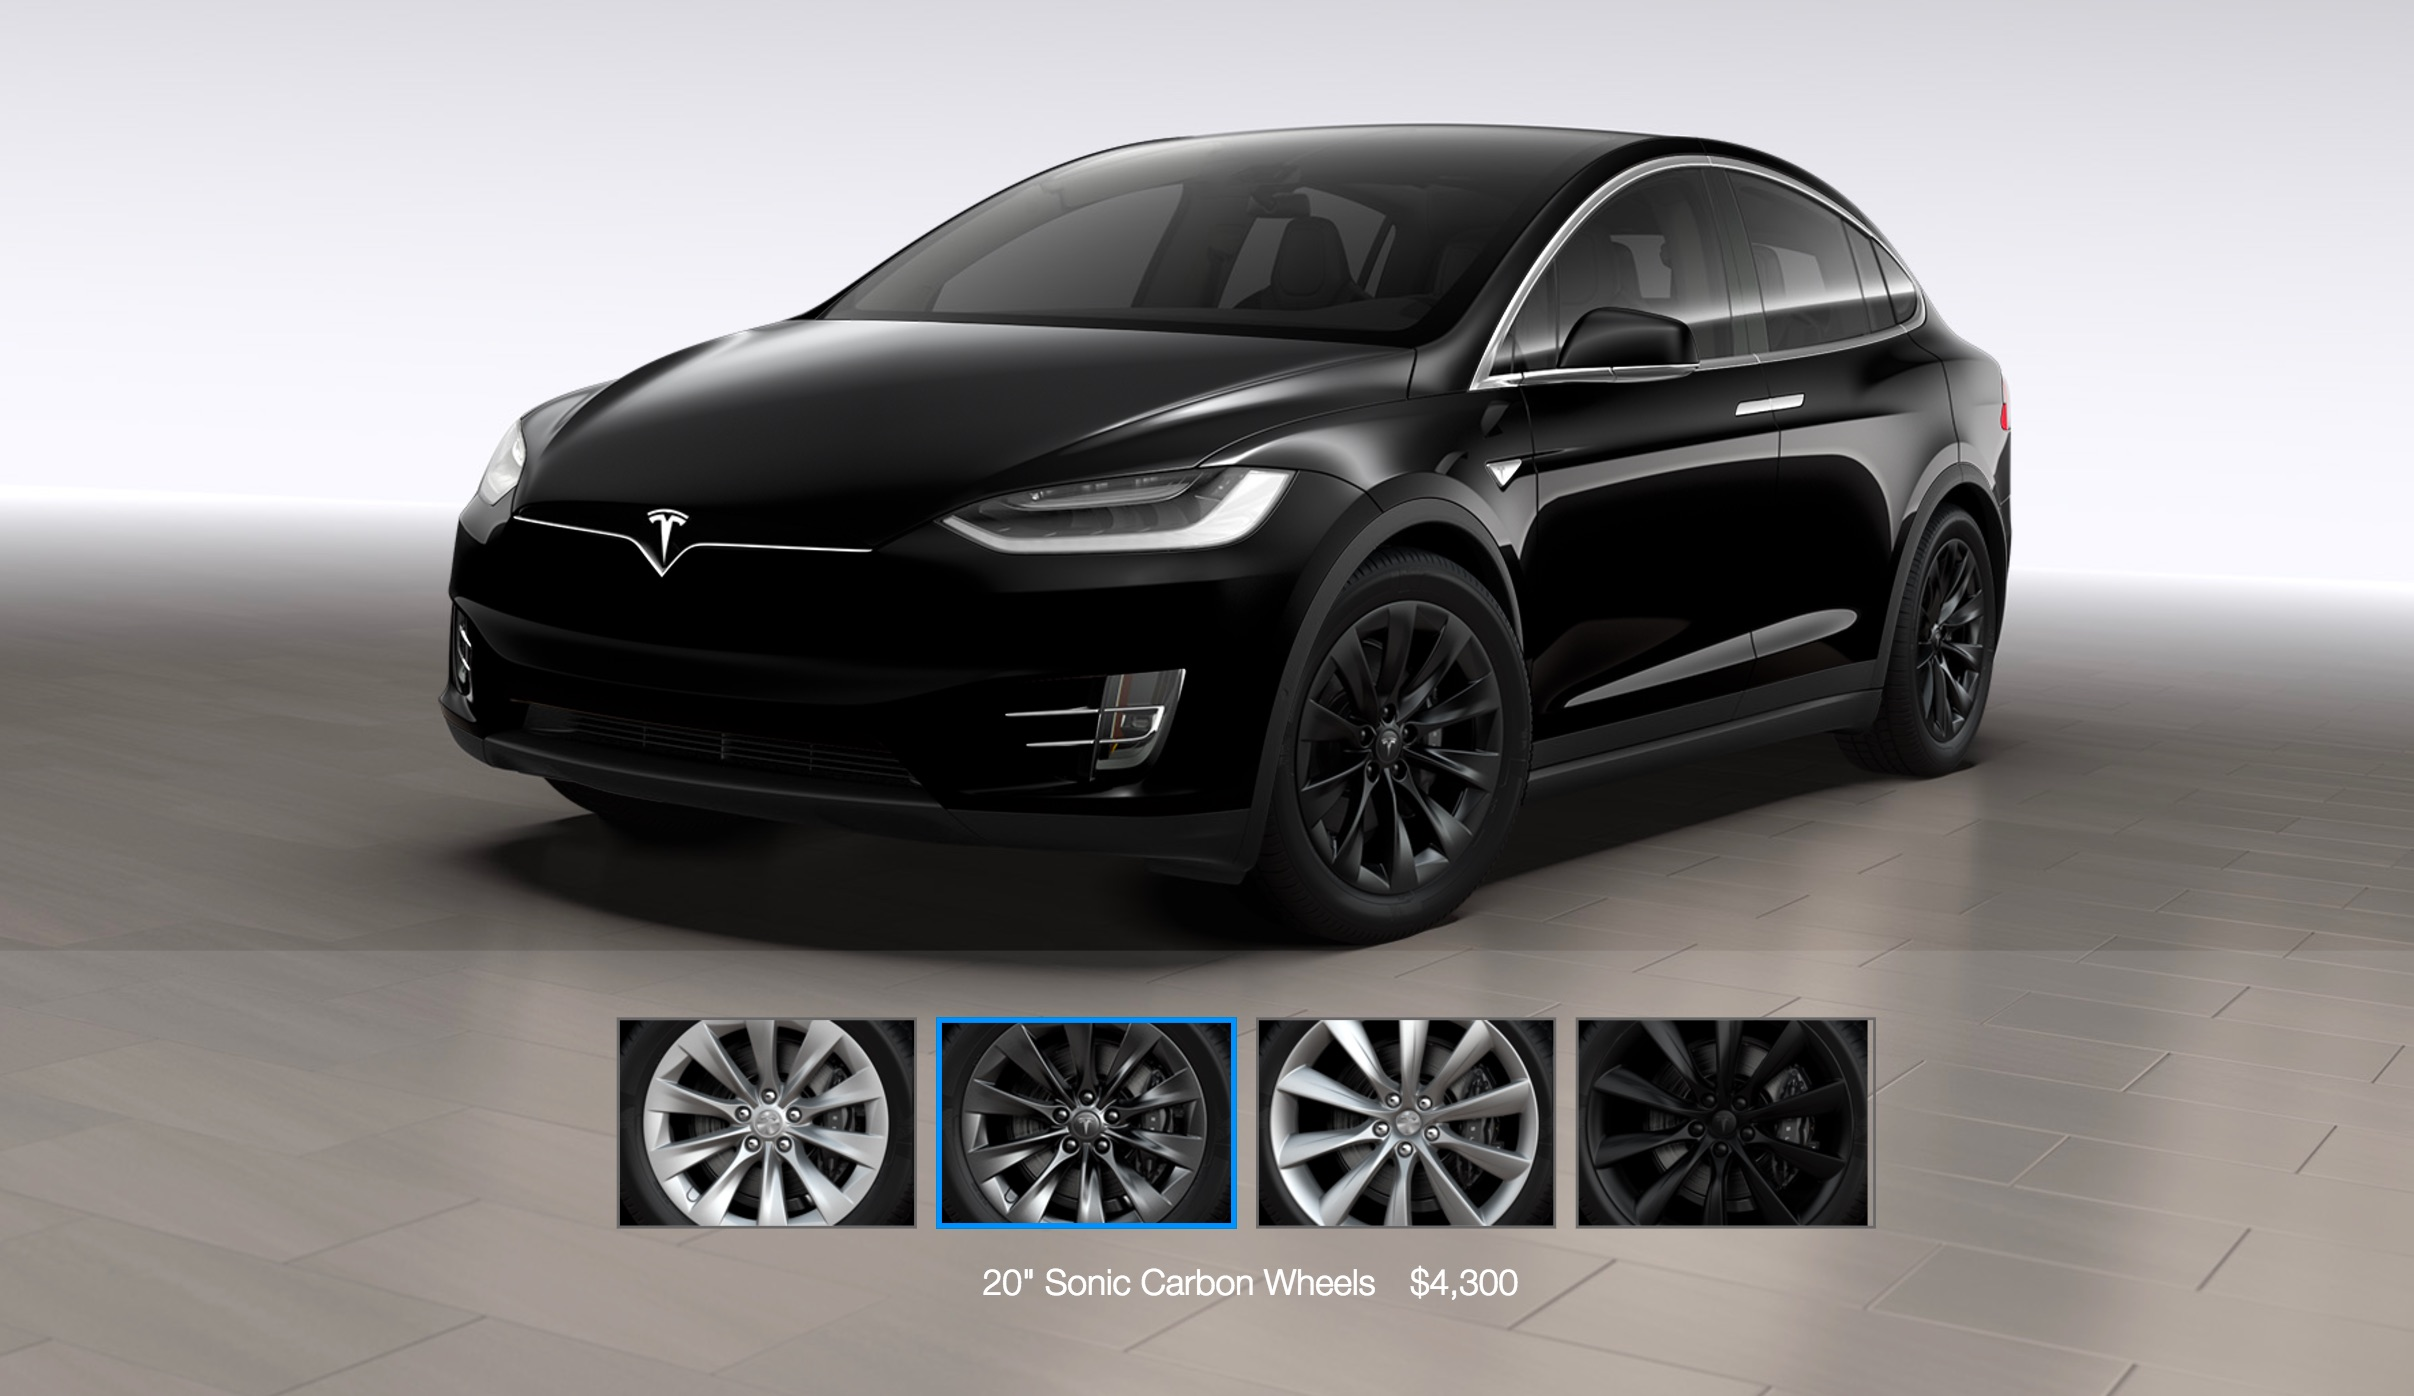 tesla model x gets a 20 sonic carbon wheel and center console option. Black Bedroom Furniture Sets. Home Design Ideas